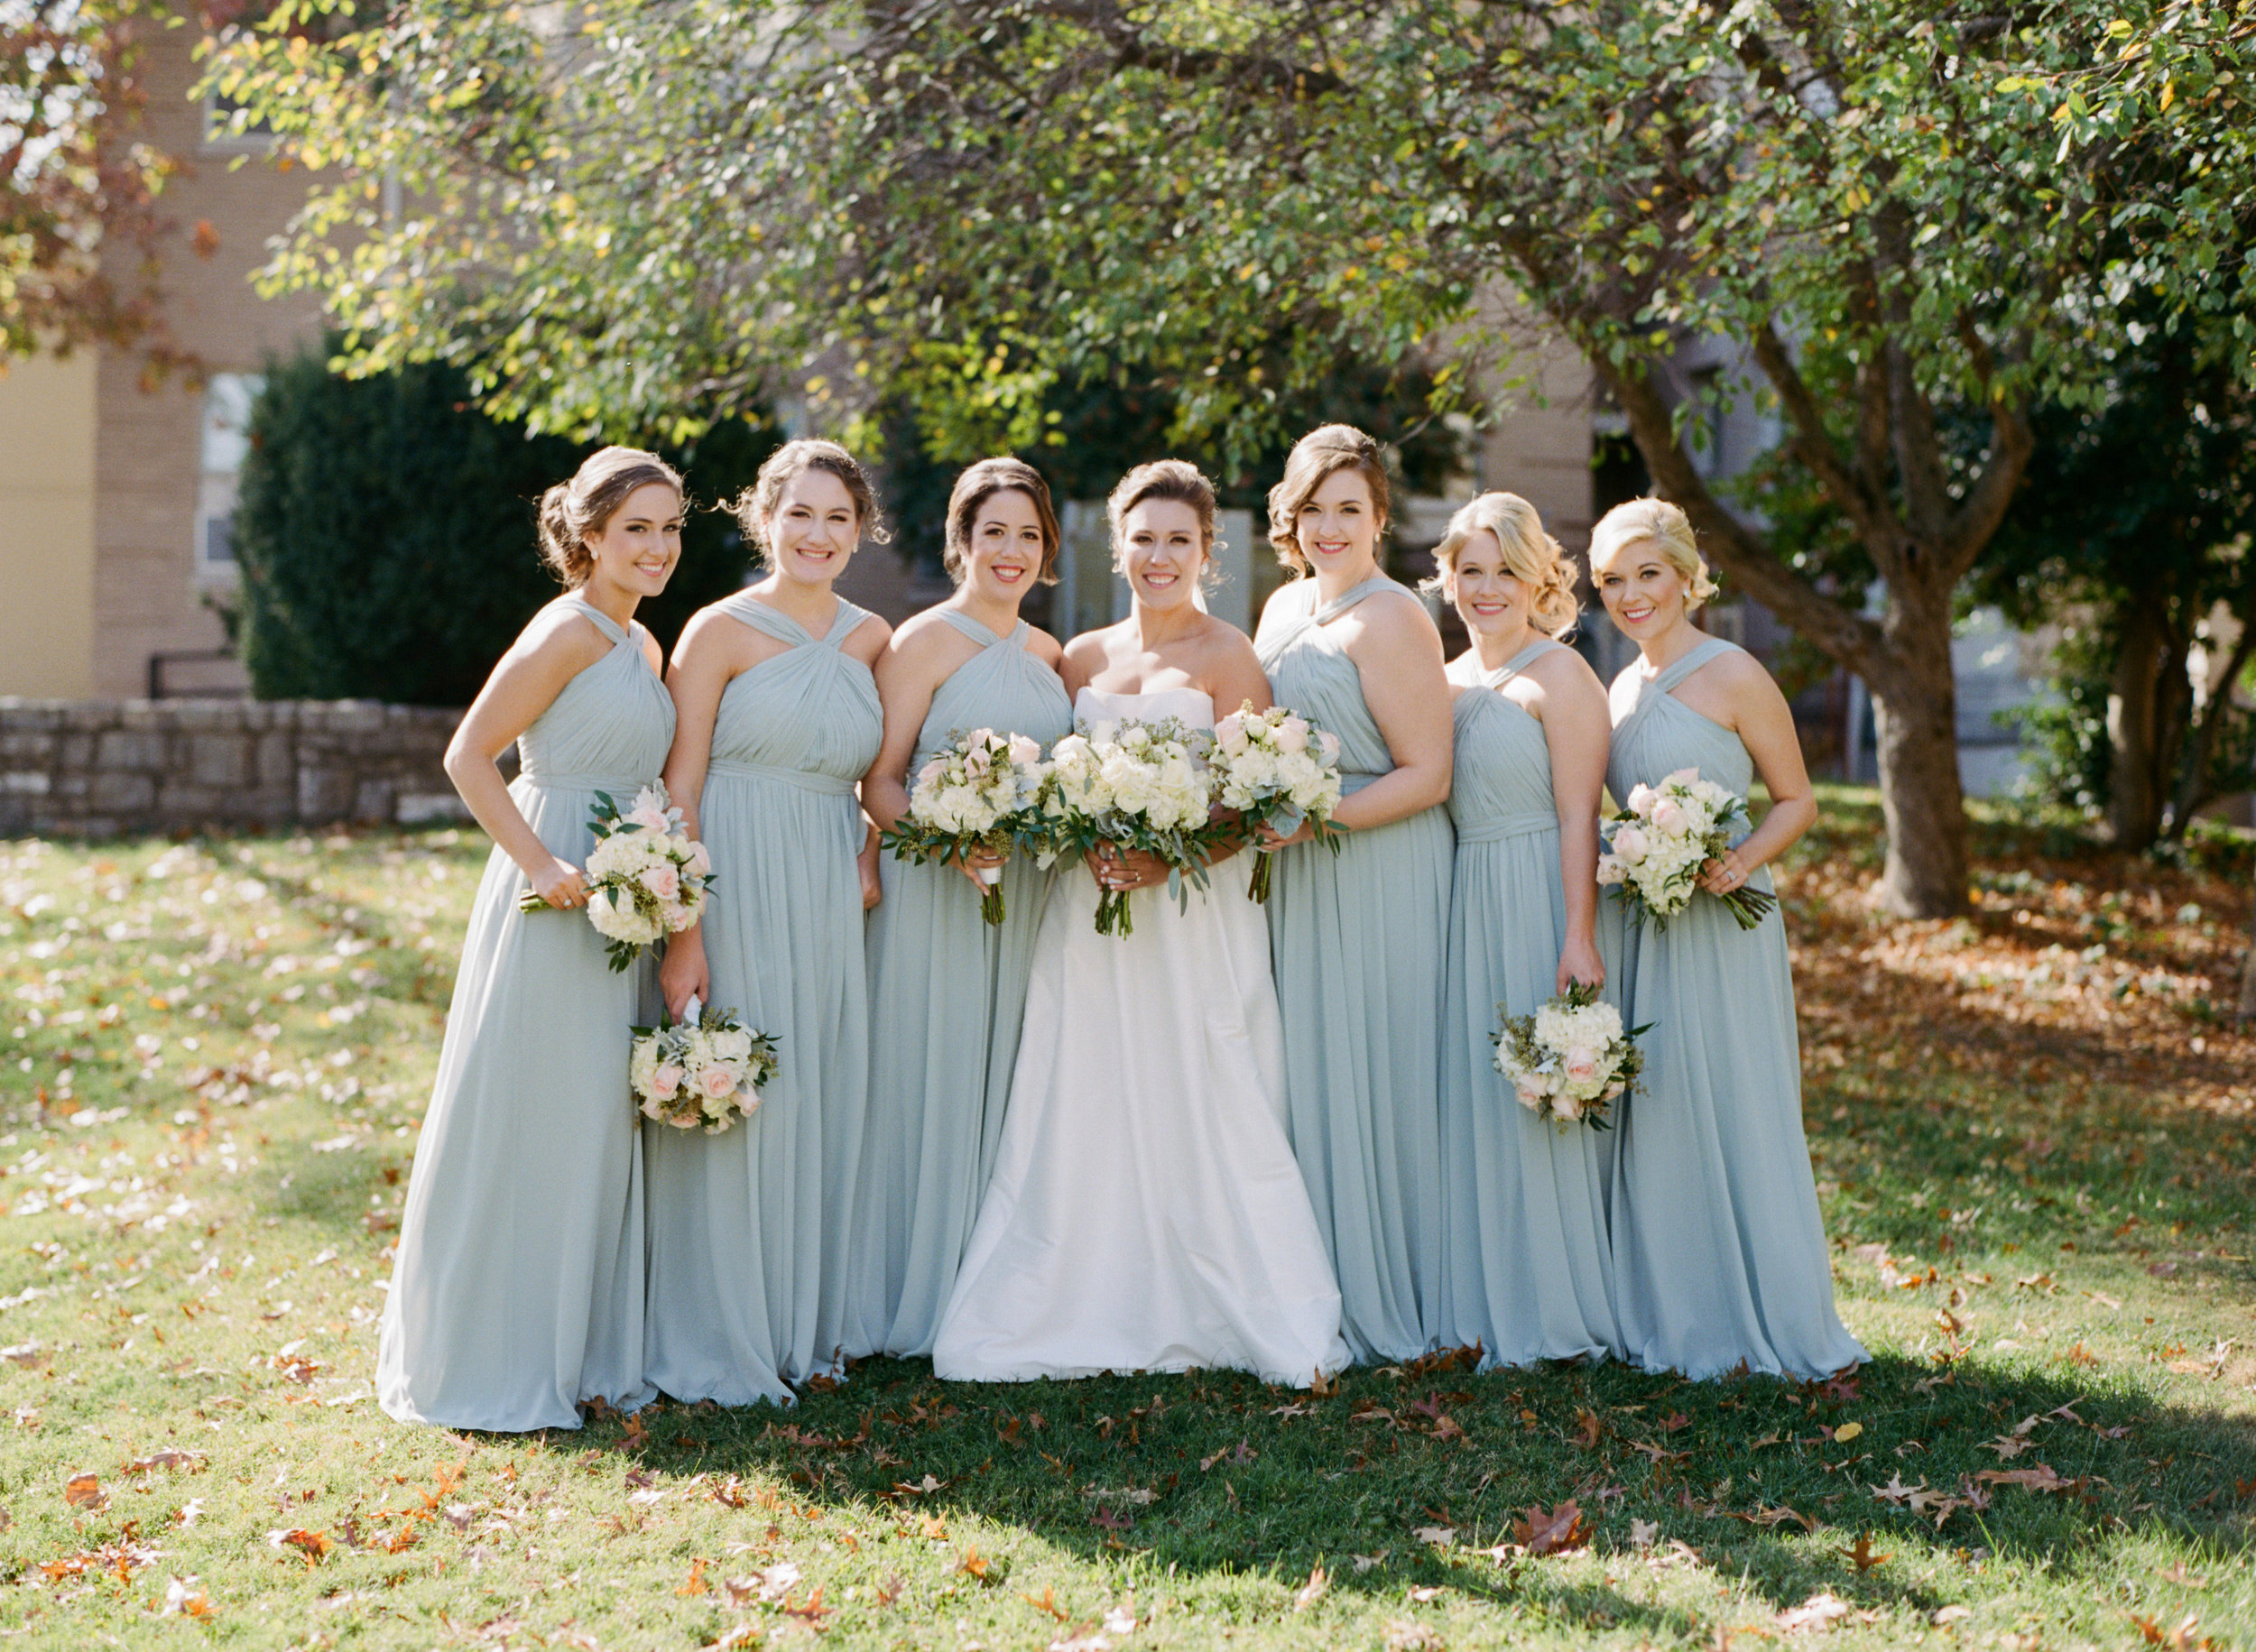 03_Bridesmaids-8.jpg